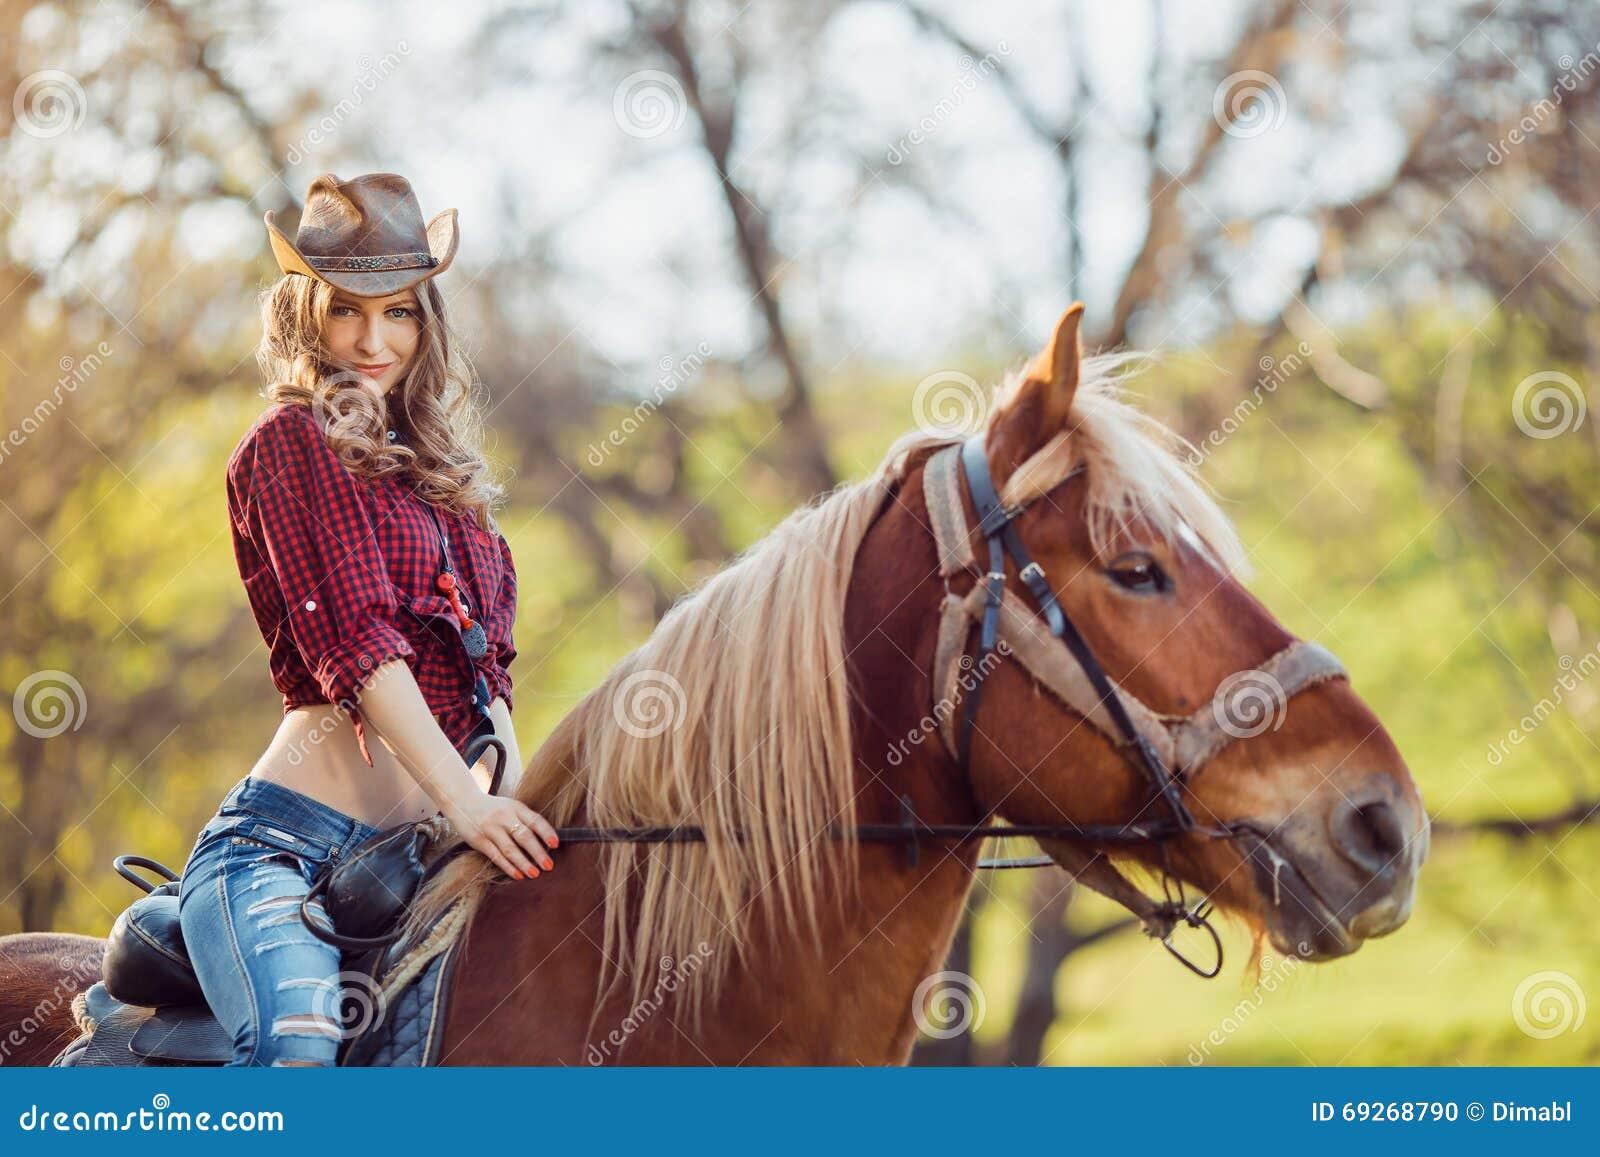 Girls riding girls